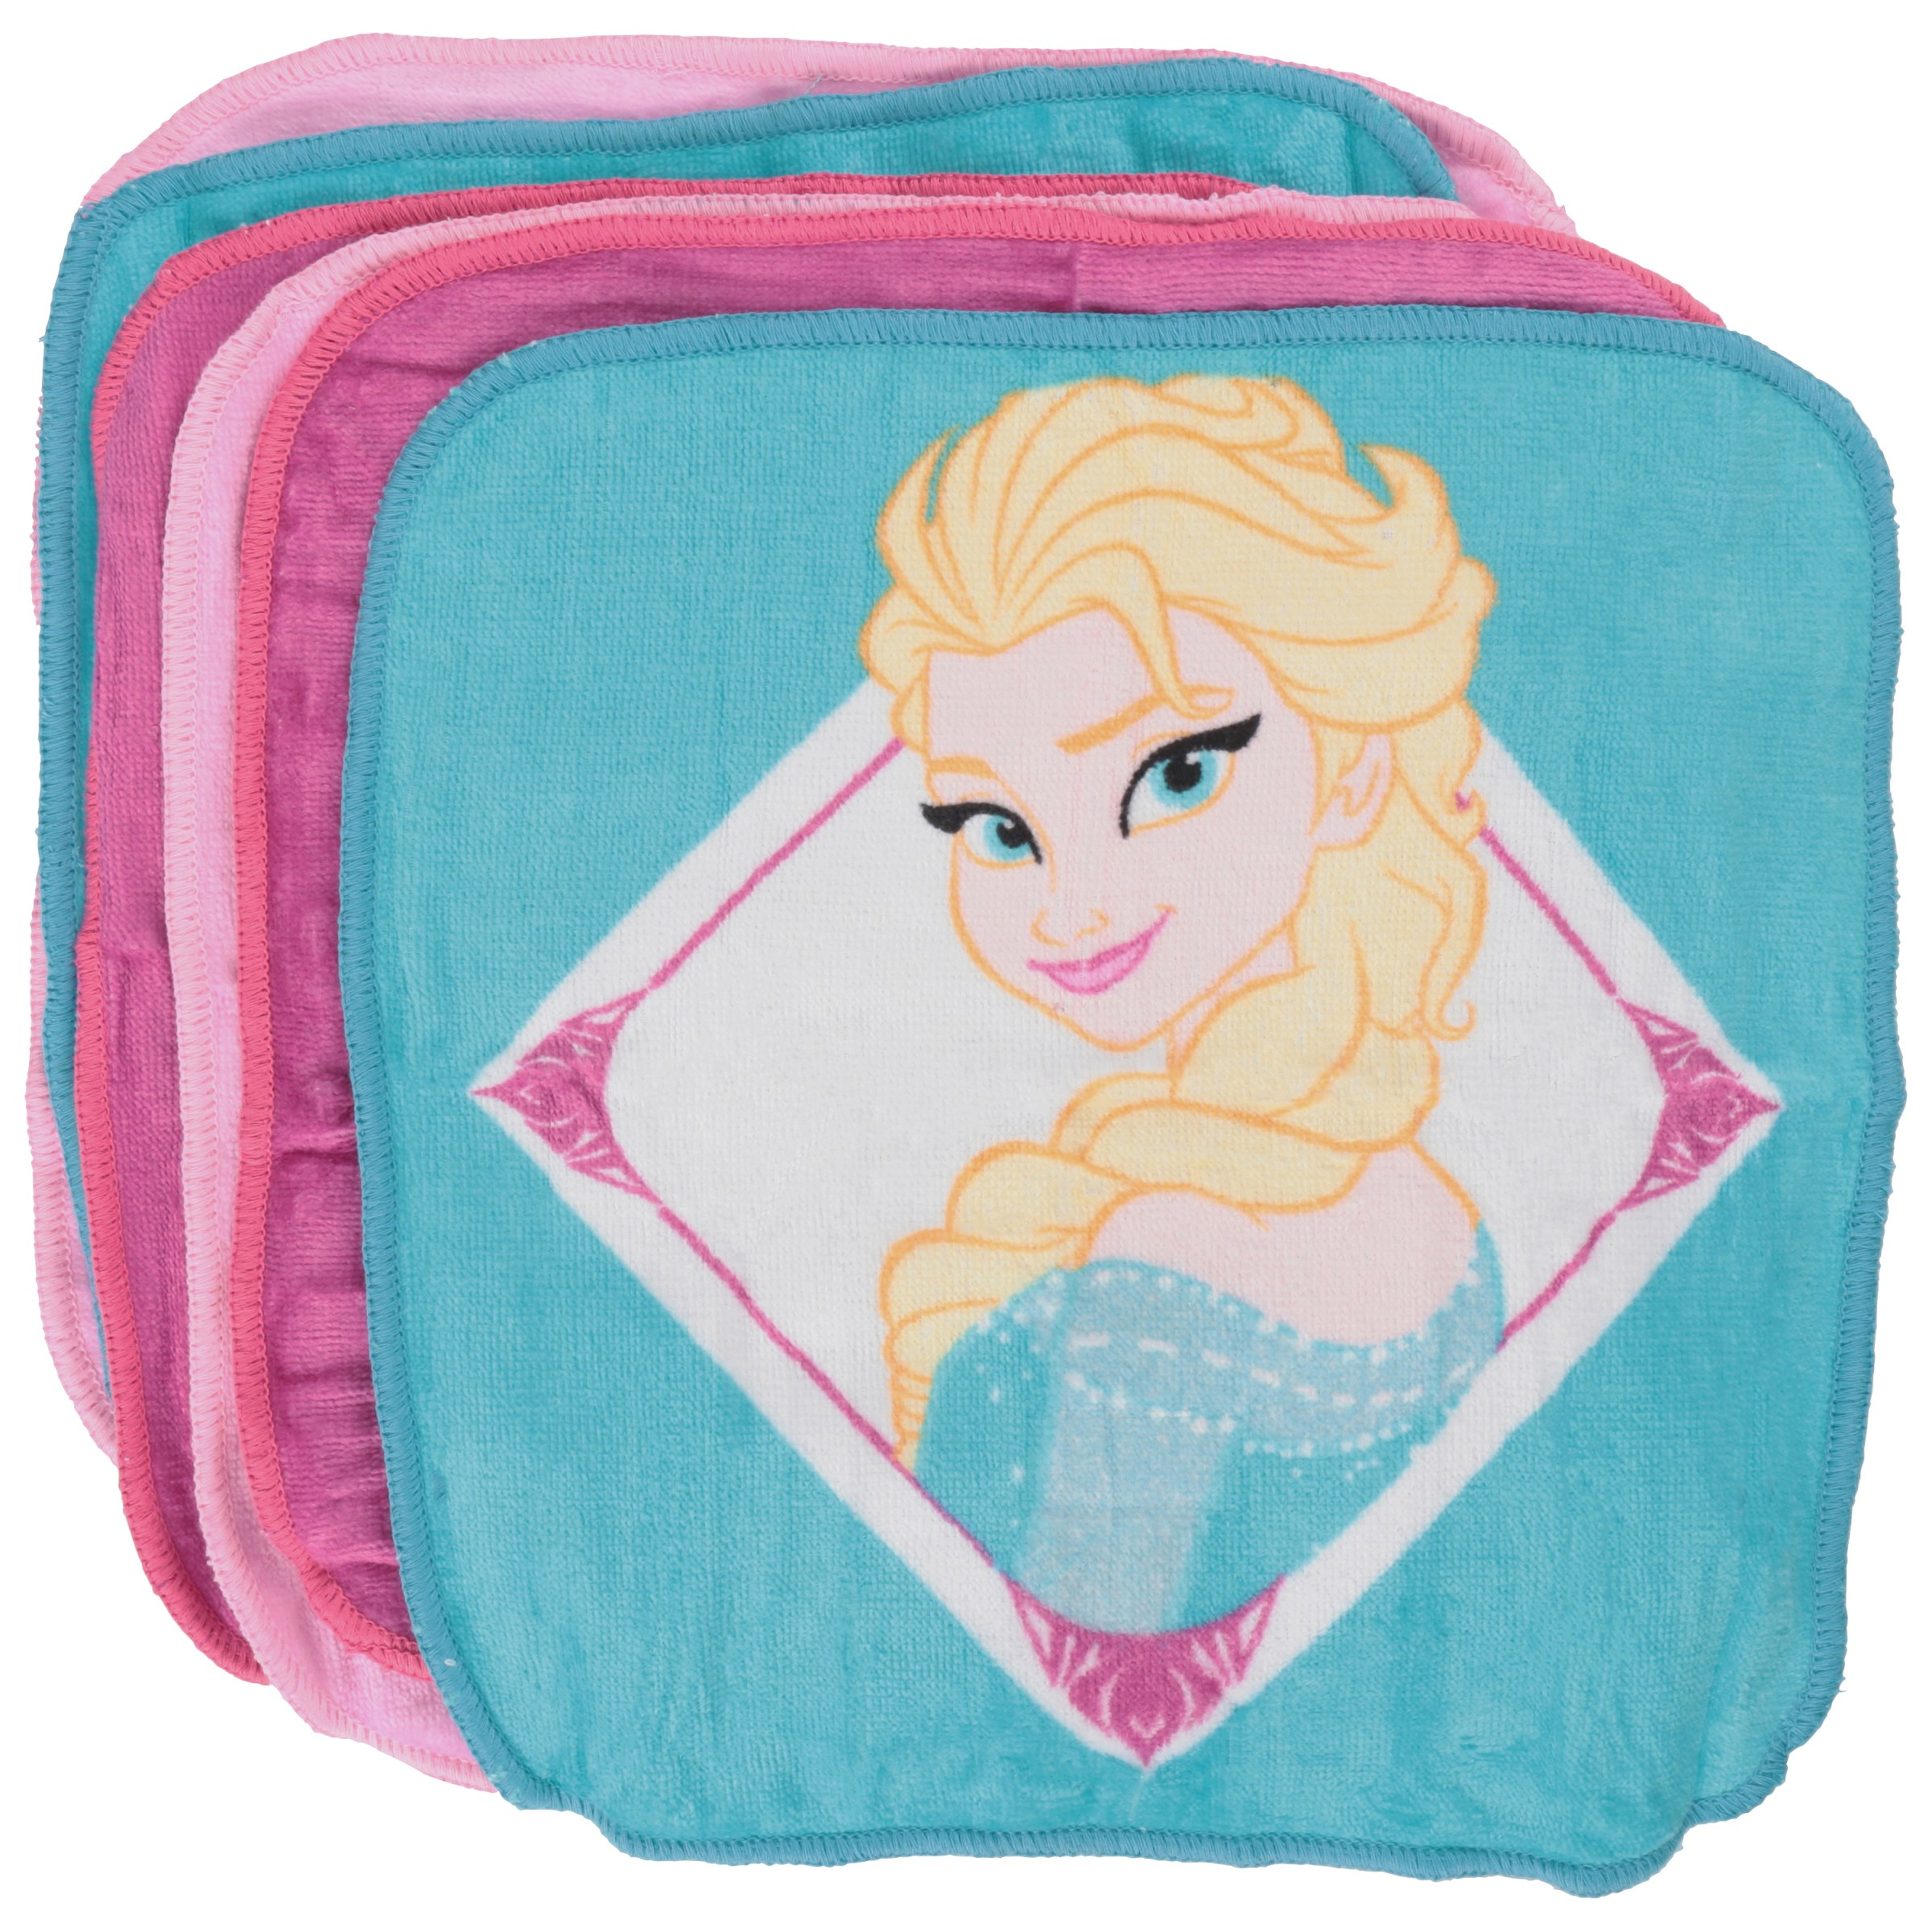 Disney Frozen Wash Cloth 6 pc Pack